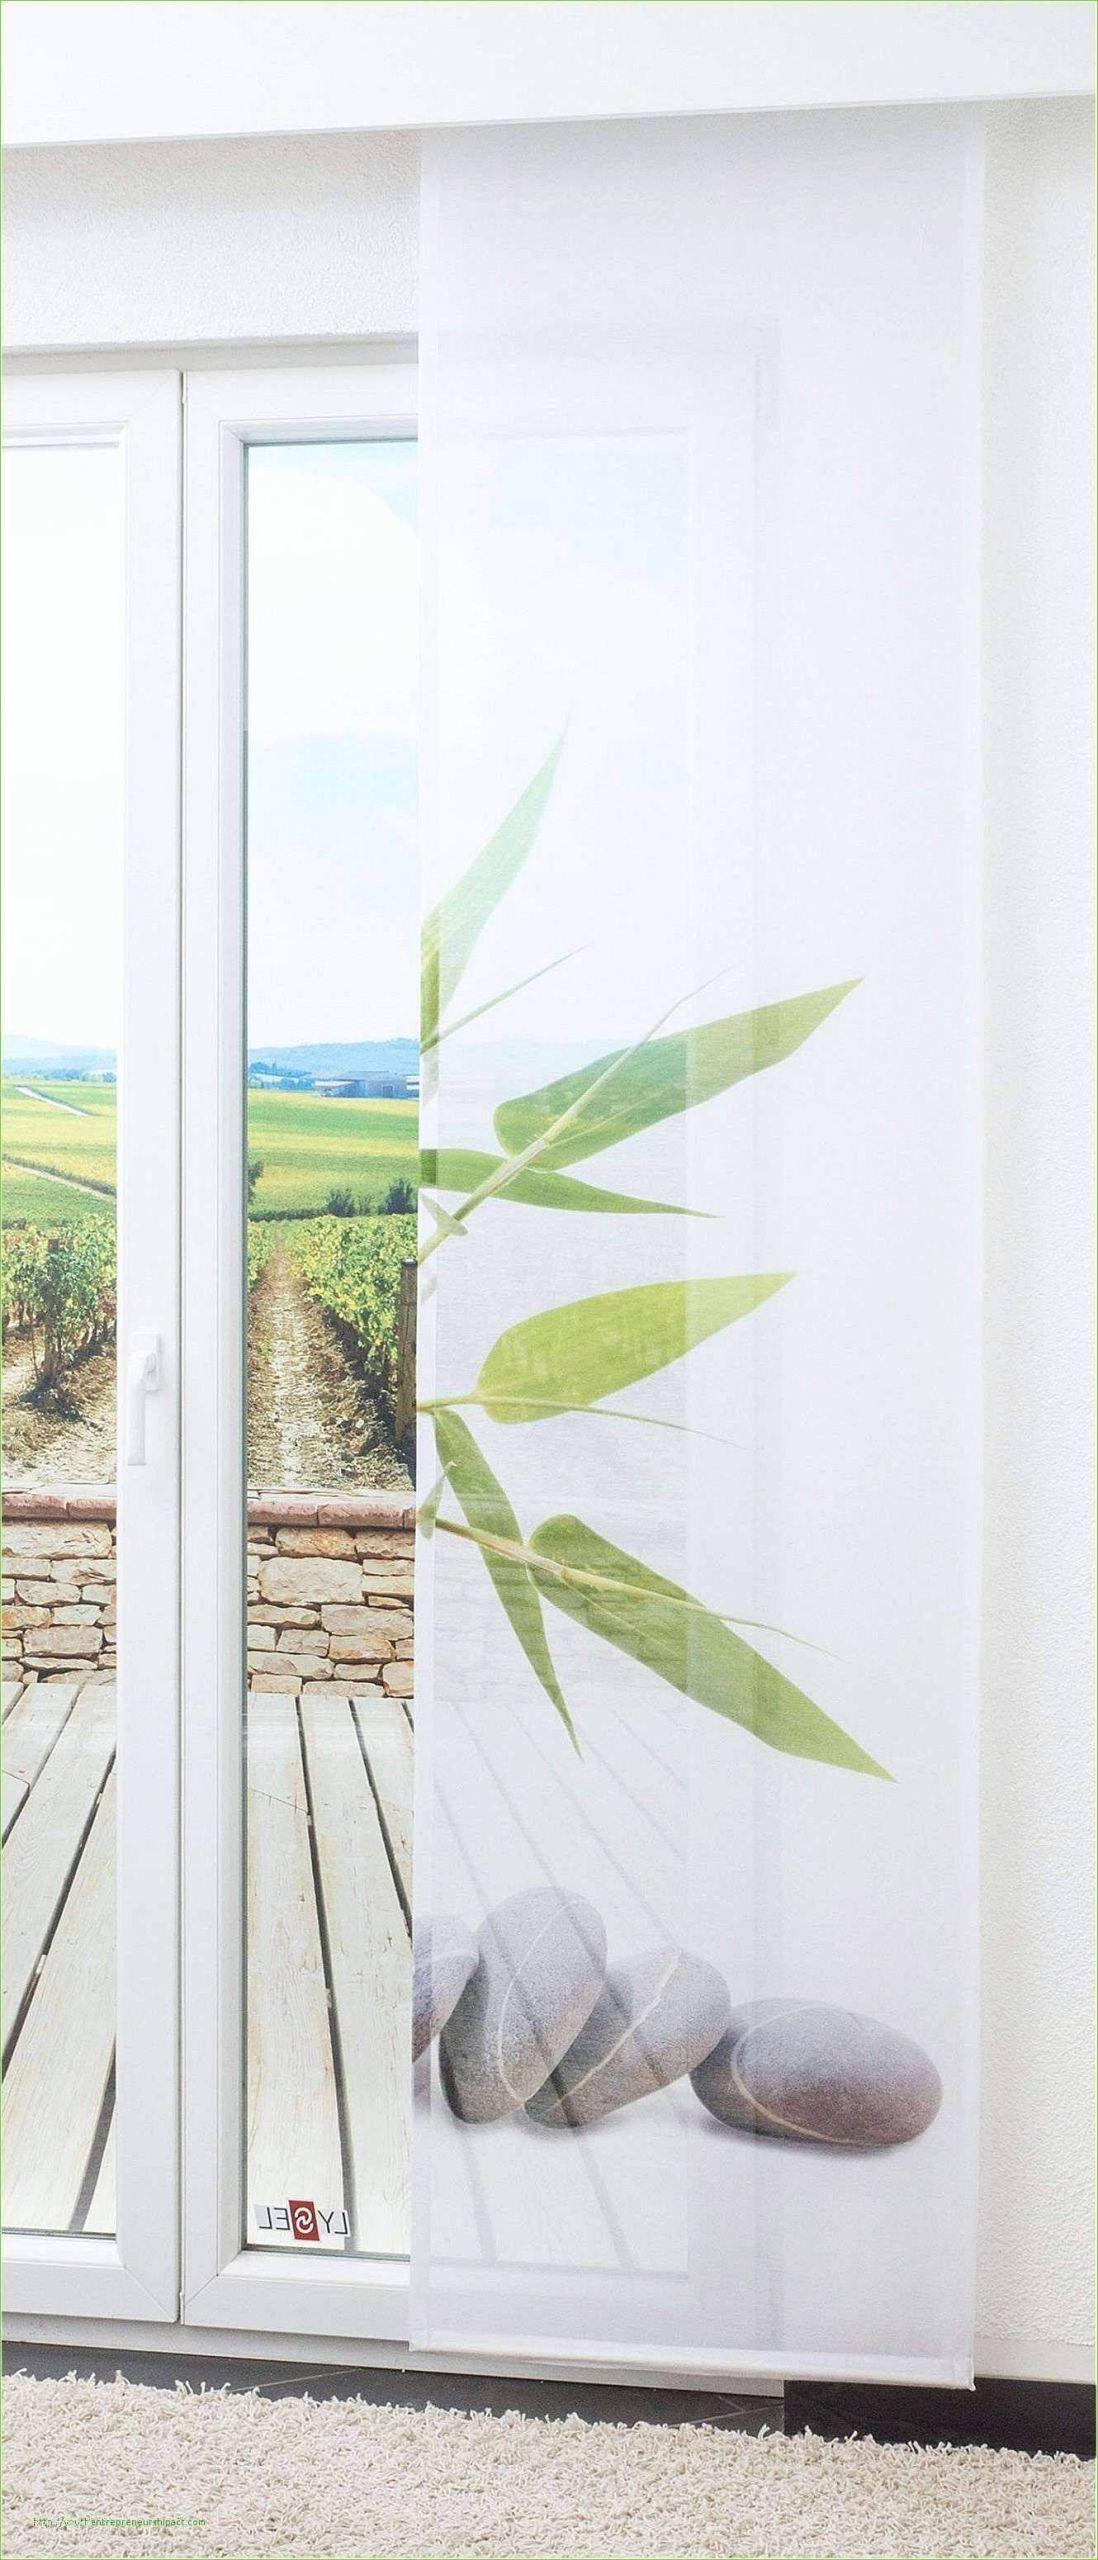 Birkenholz Deko Selber Machen Frisch 39 Inspirierend Wanddeko Wohnzimmer Holz Neu